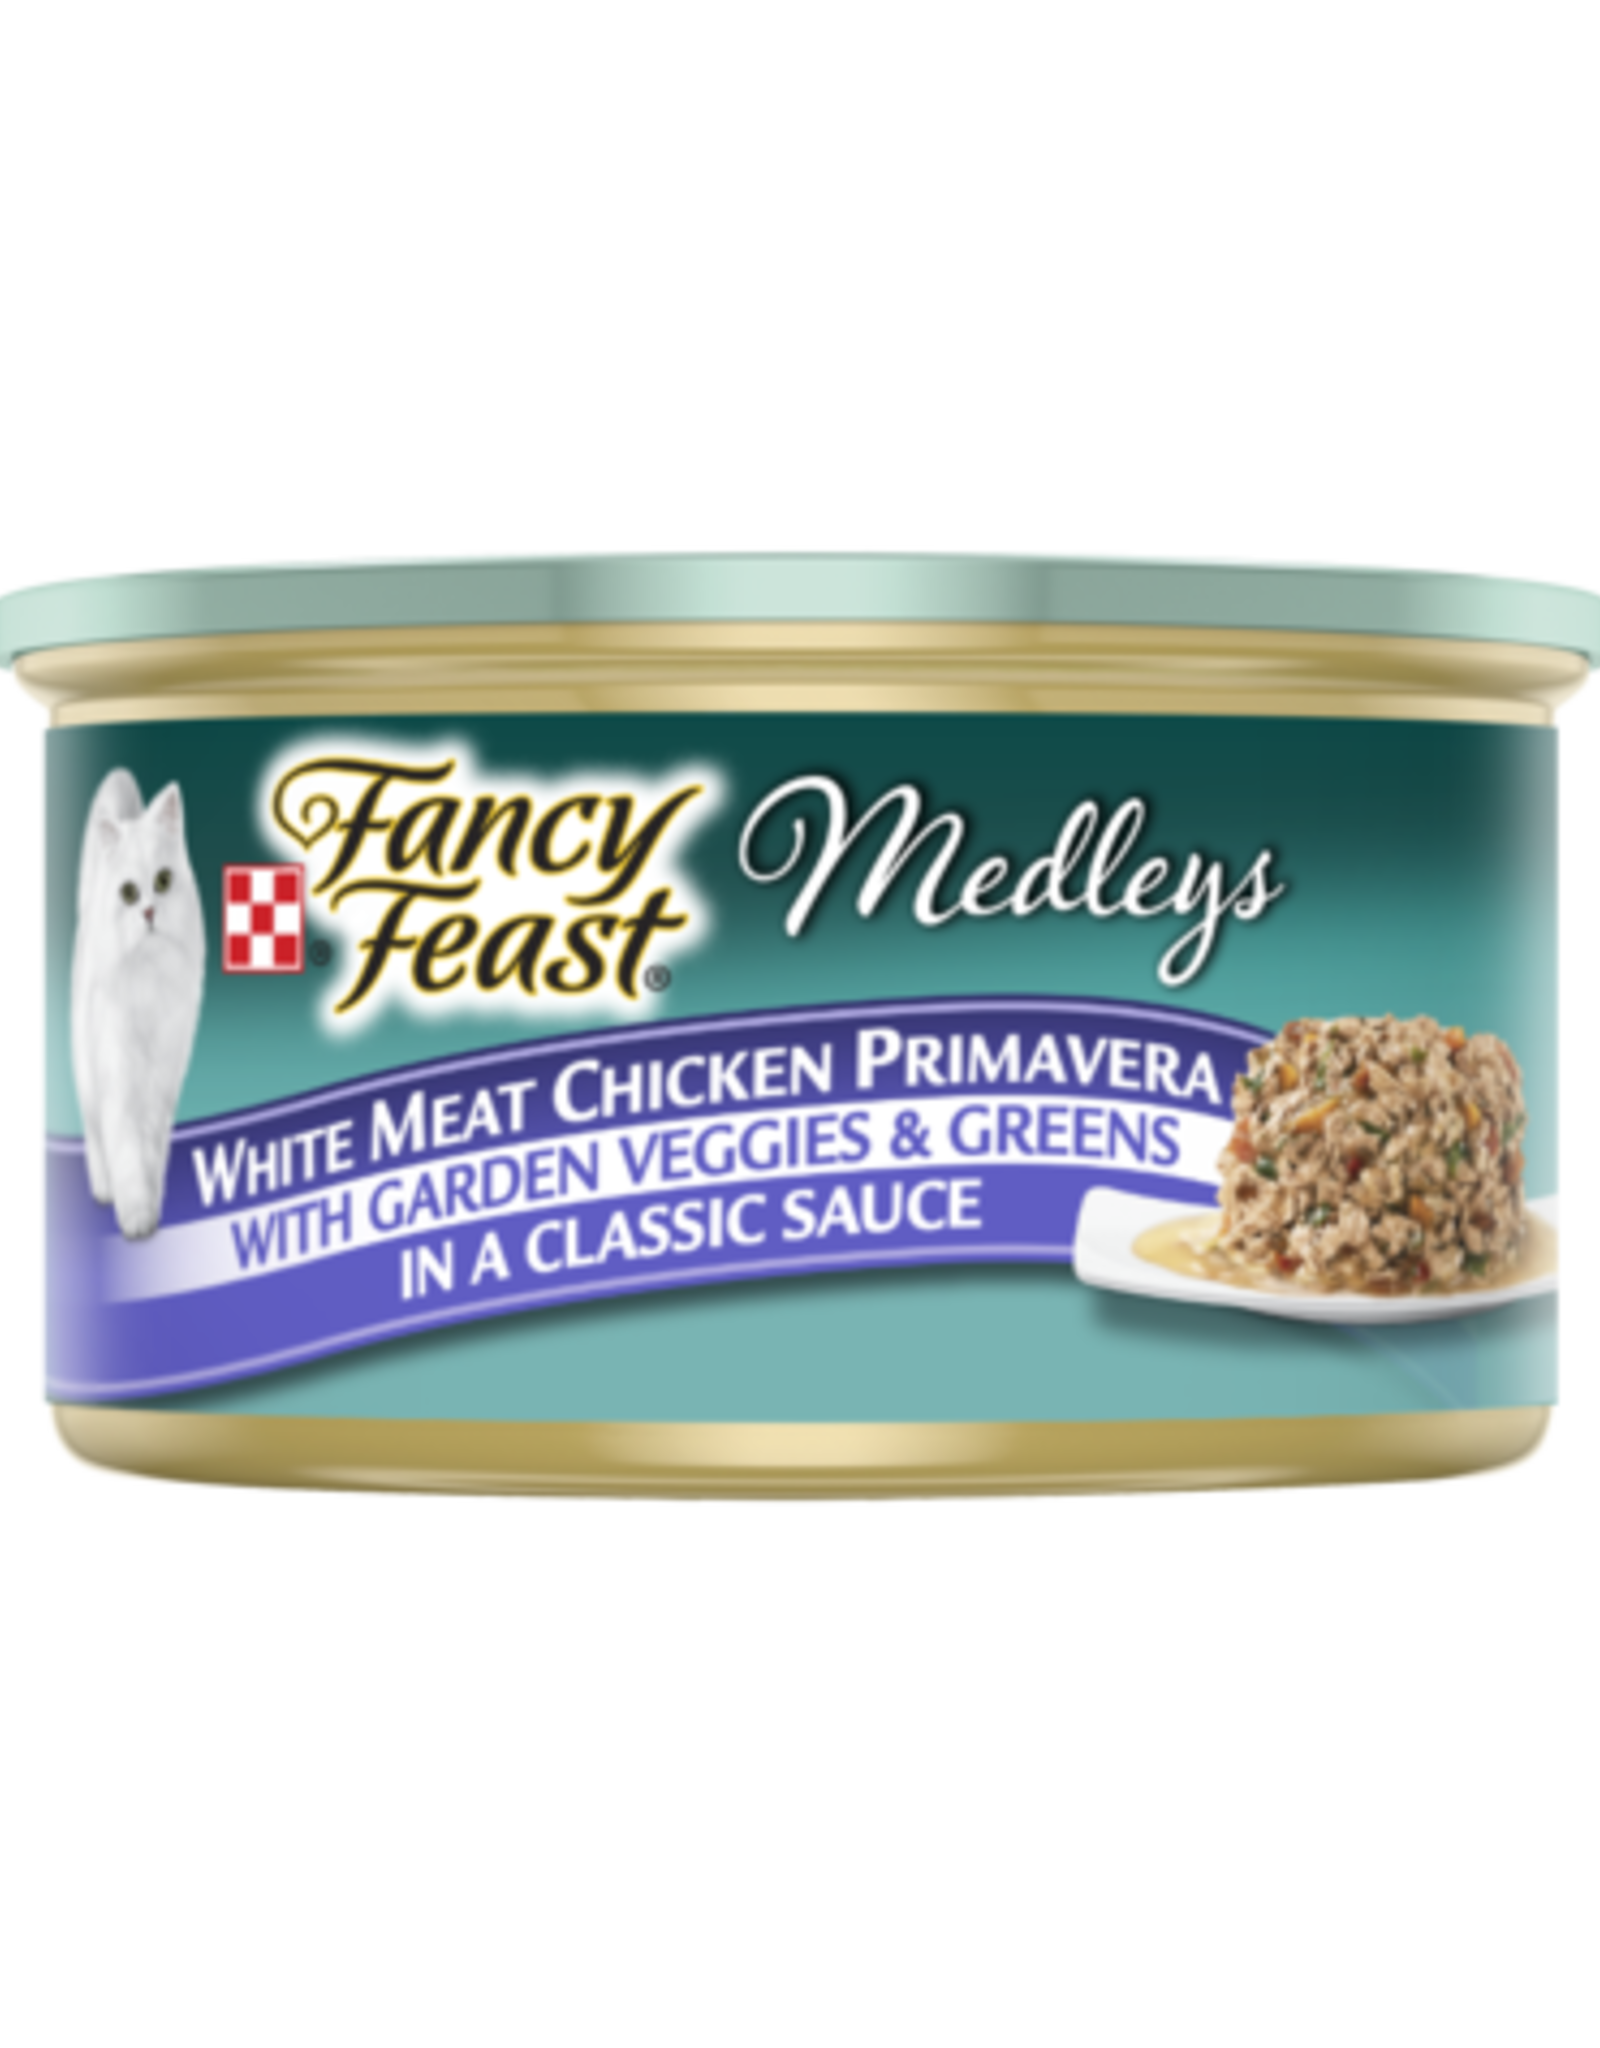 FANCY FEAST MEDLEYS CHICKEN PRIMAVERA 3OZ CASE OF 24